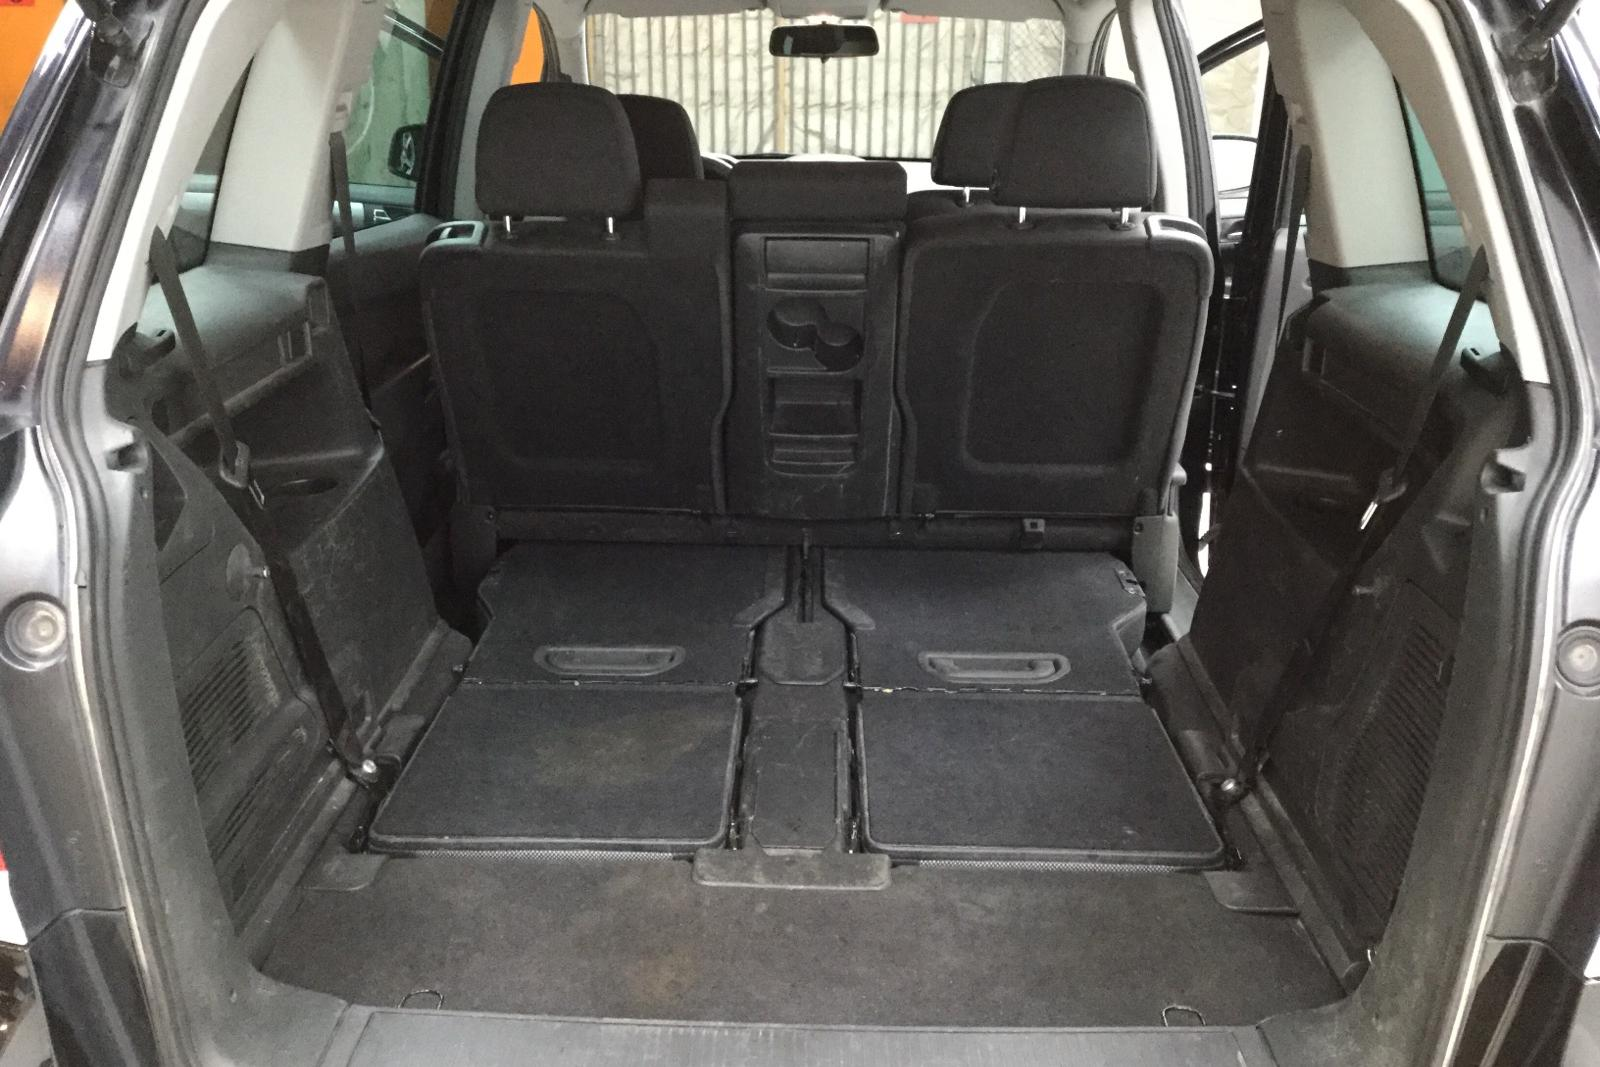 Opel Zafira II 1.6 CNG Turbo ecoFLEX (150hk) - 0 km - Manual - black - 2011